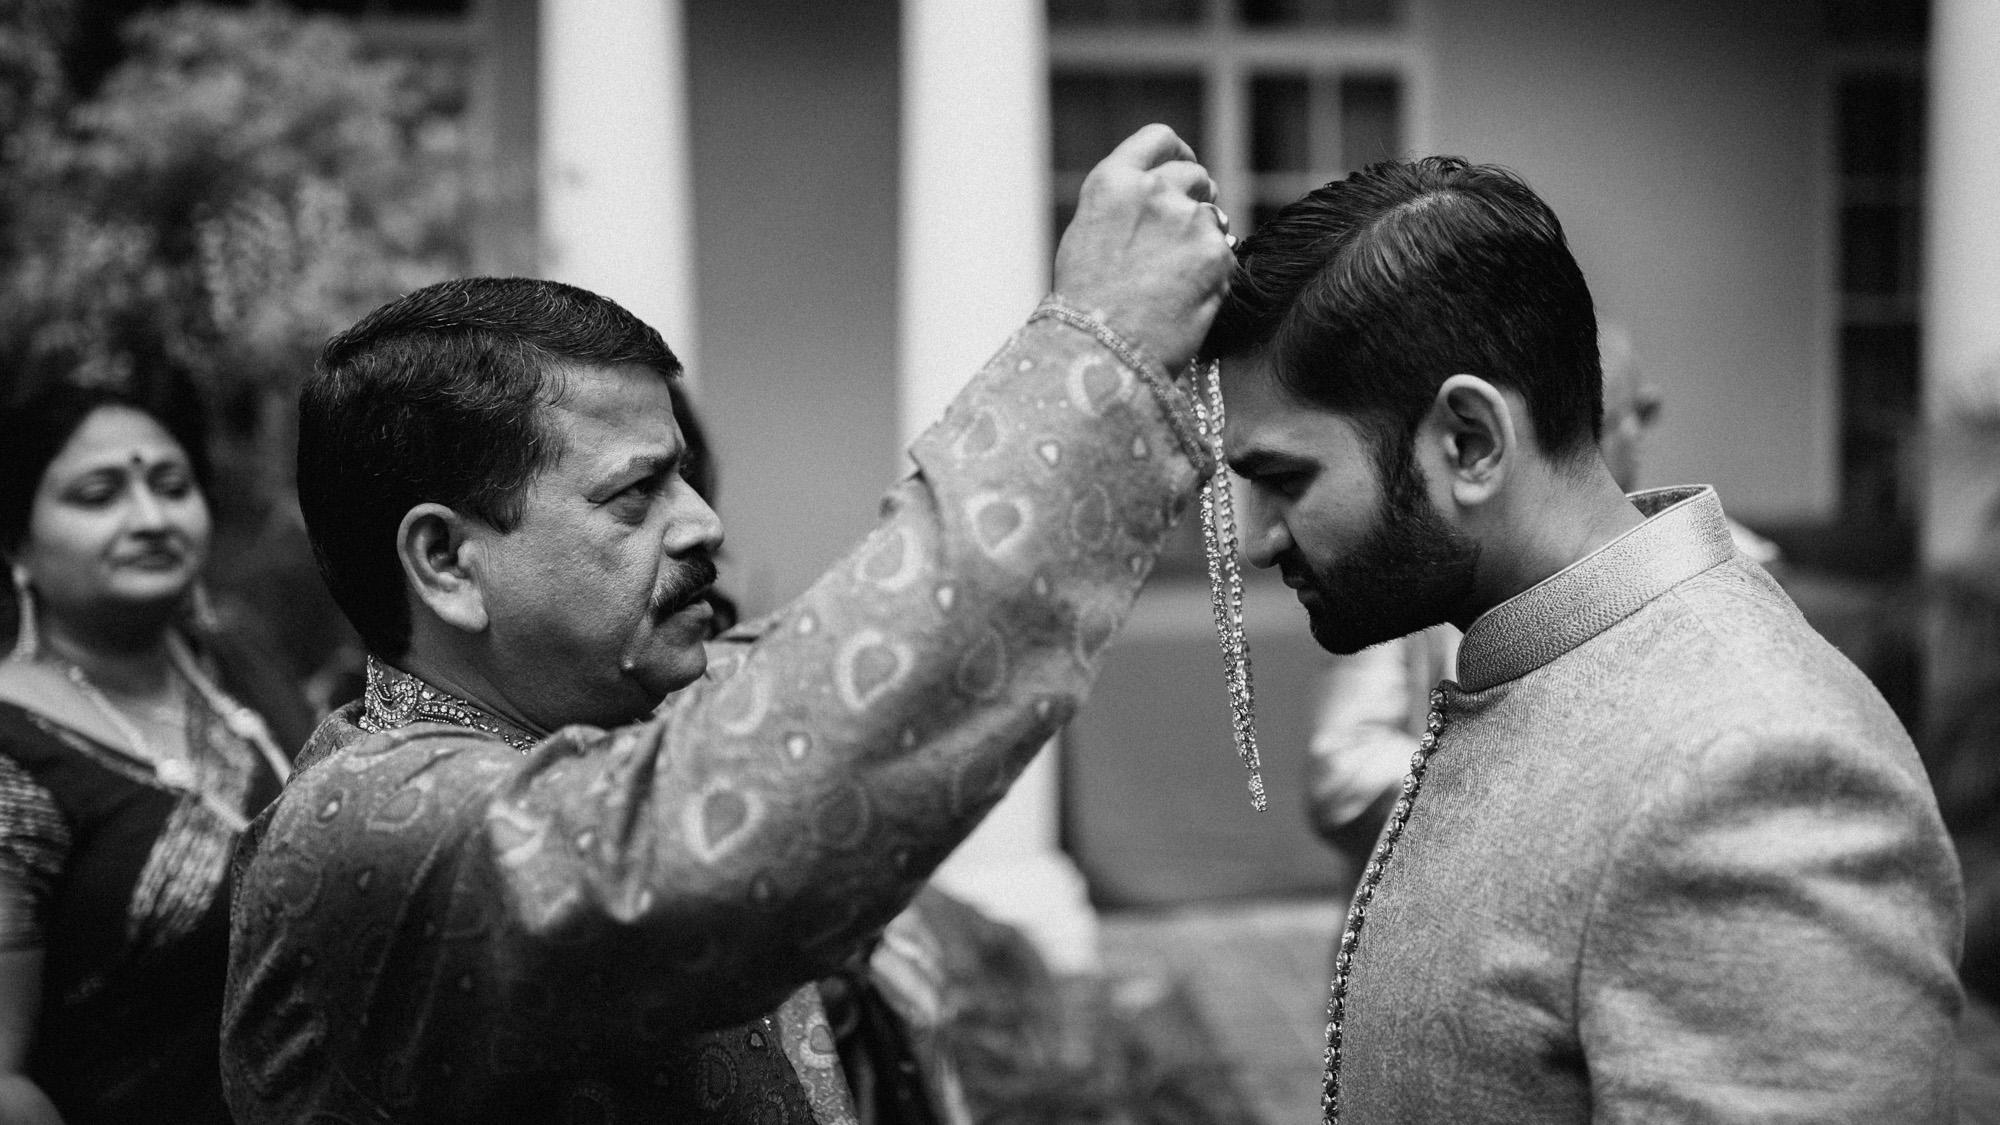 anu_maneesh_alec_vanderboom_Indian_wedding_photography-0062.jpg